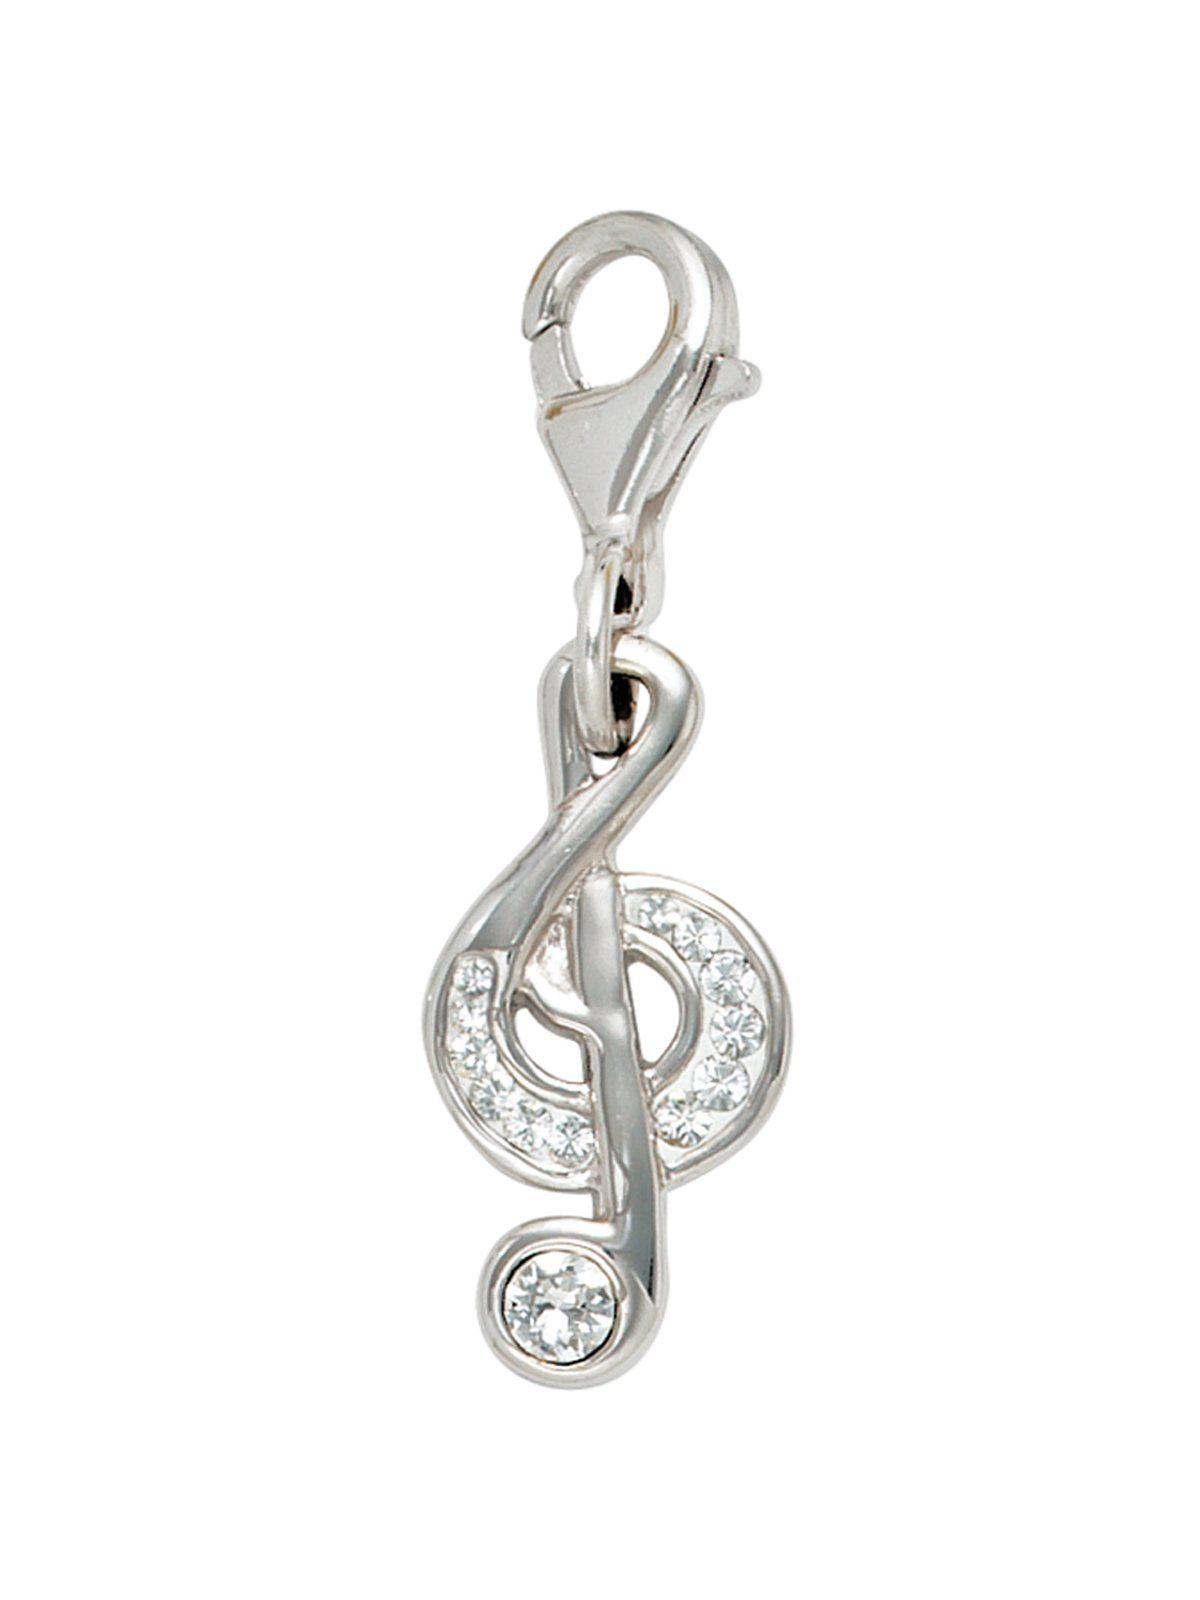 Adelia´s Kettenanhänger »Notenschlüssel Anhänger« 925 Silber mit Swarovski Kristall